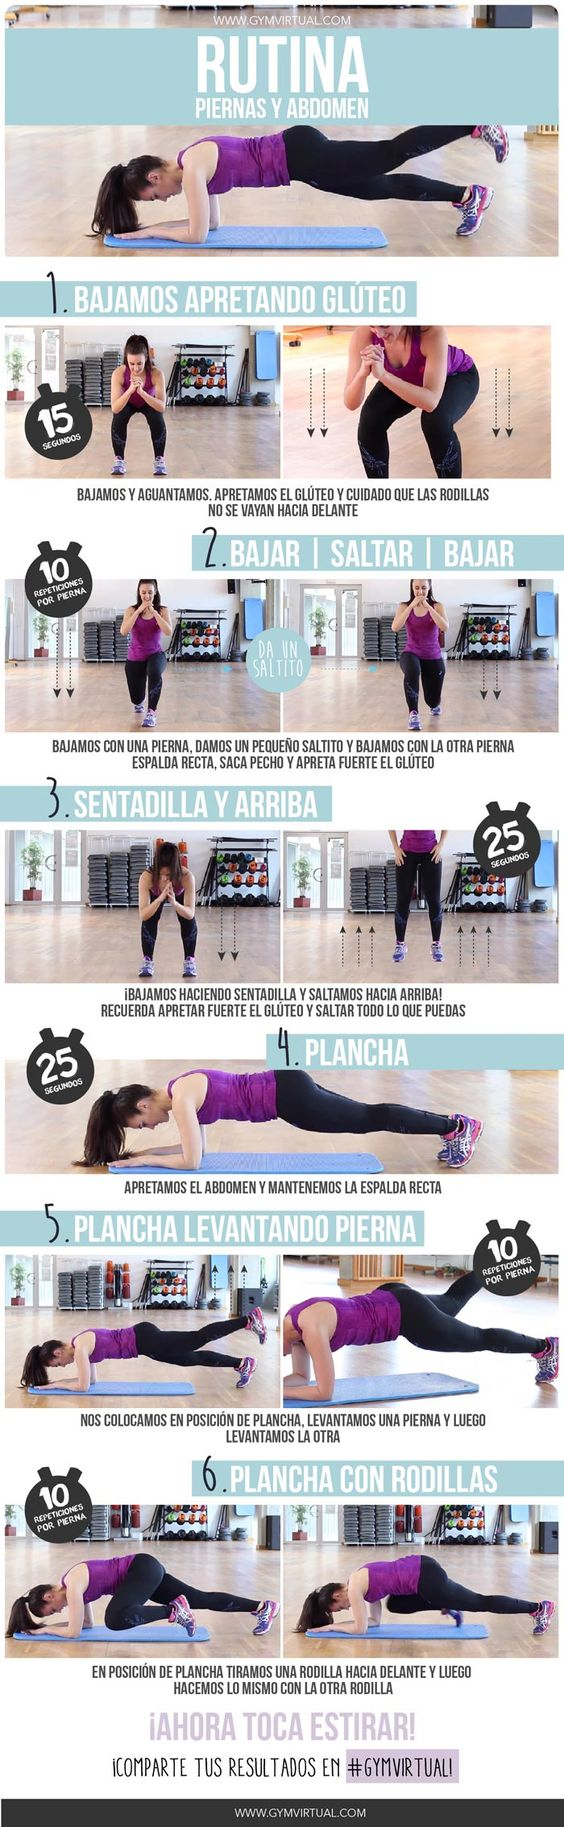 Rutina paso a paso para trabajar piernas y abdomen for Rutinas gimnasio